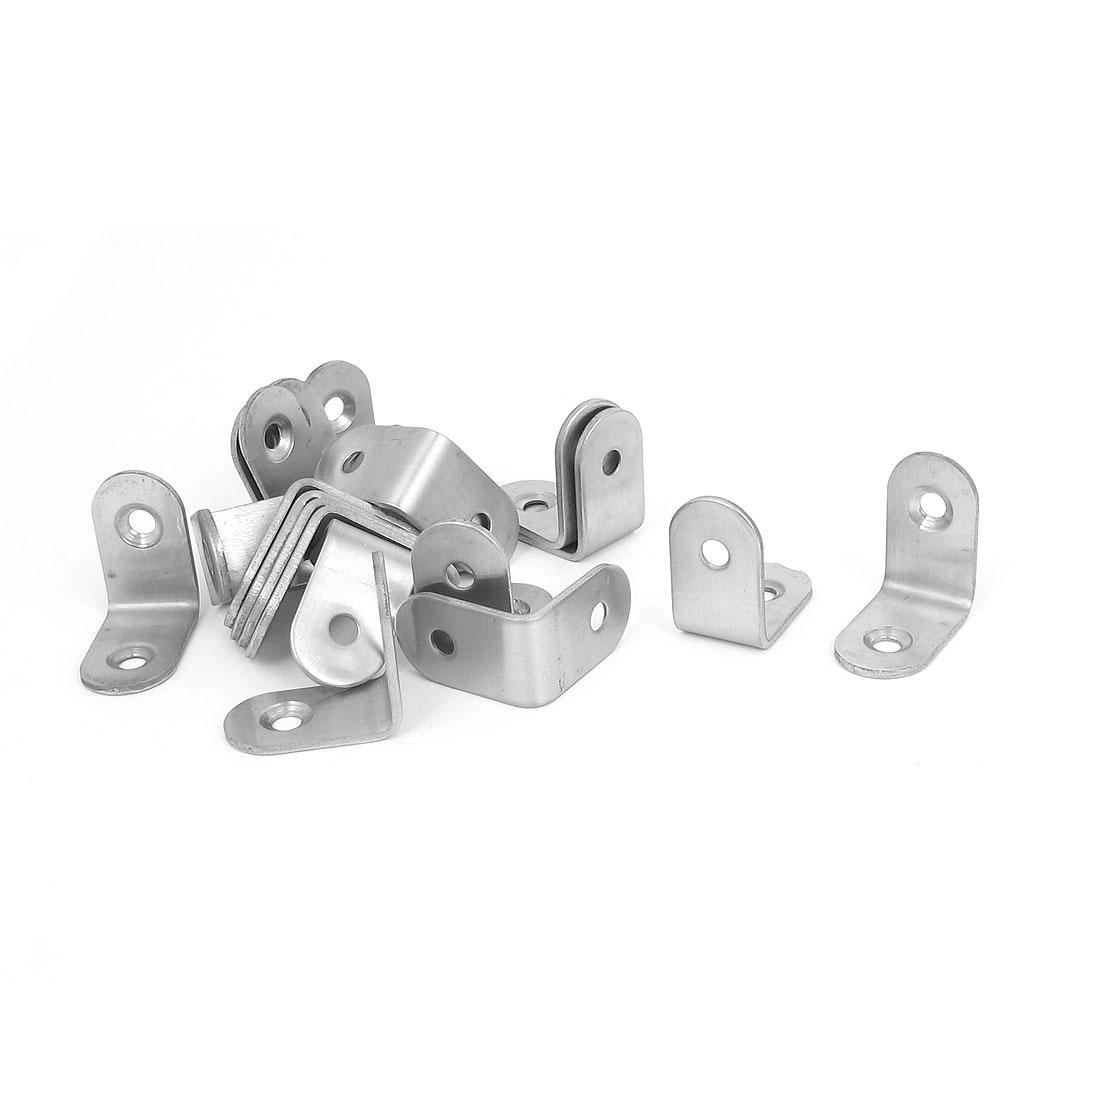 25mmx25mm L Shape Shelf Corner Brace Repair Right Angle Bracket Support 20pcs